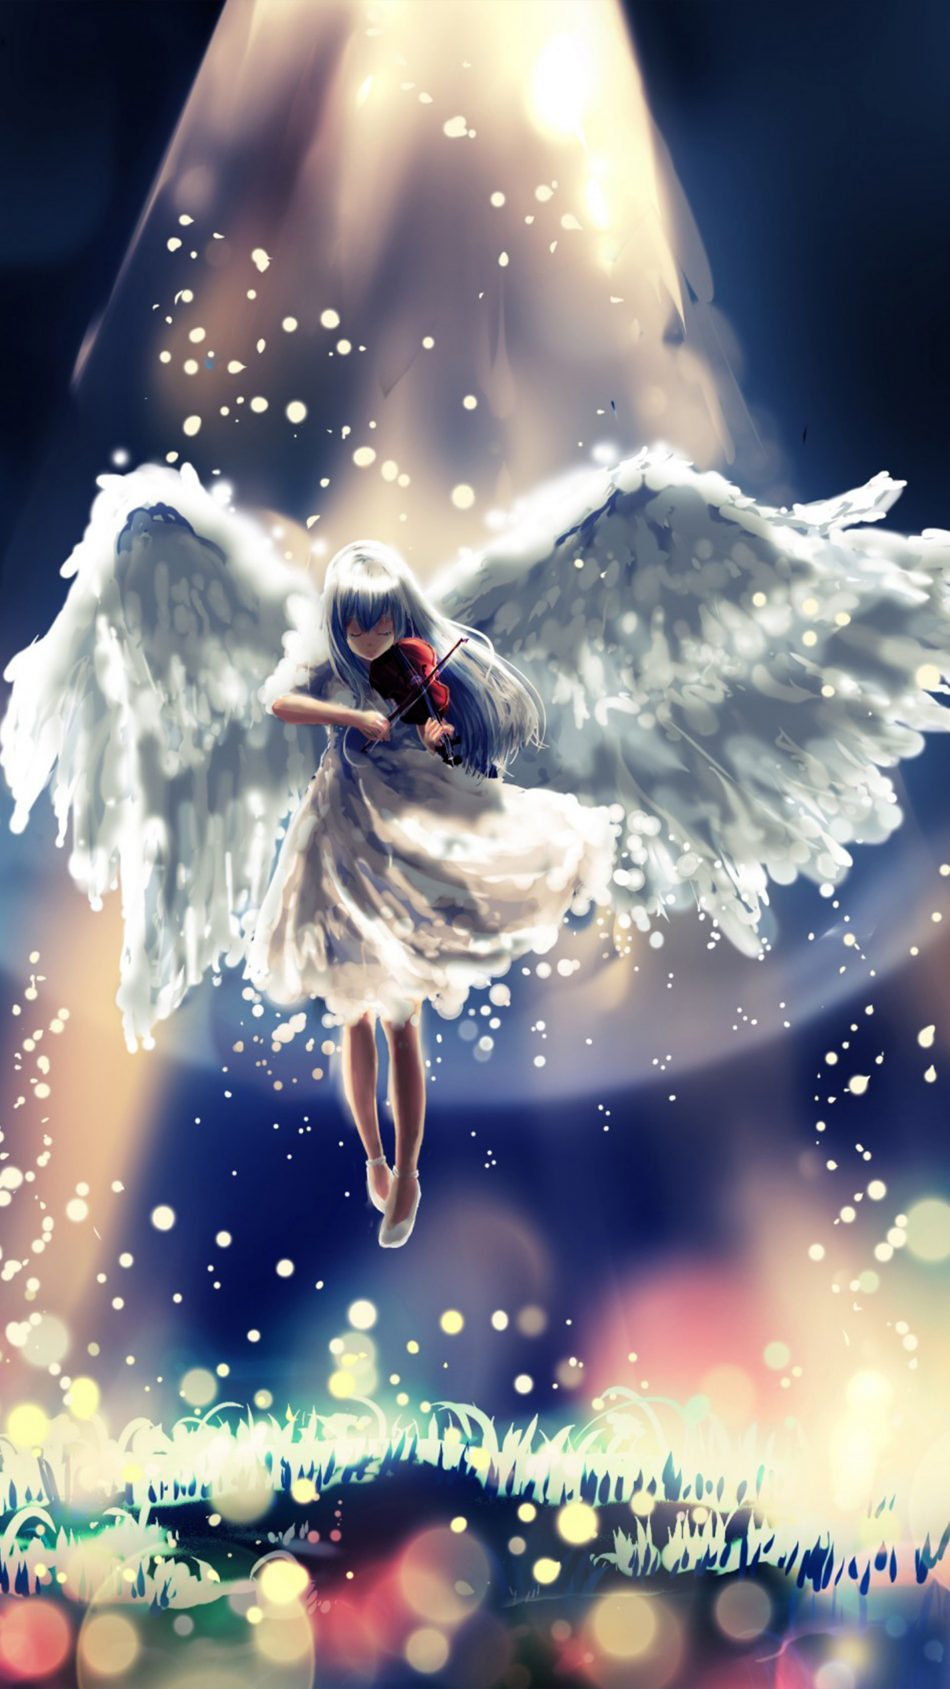 Download anime girl angel guitar heaven free pure 4k ultra - Anime phone wallpaper 4k ...